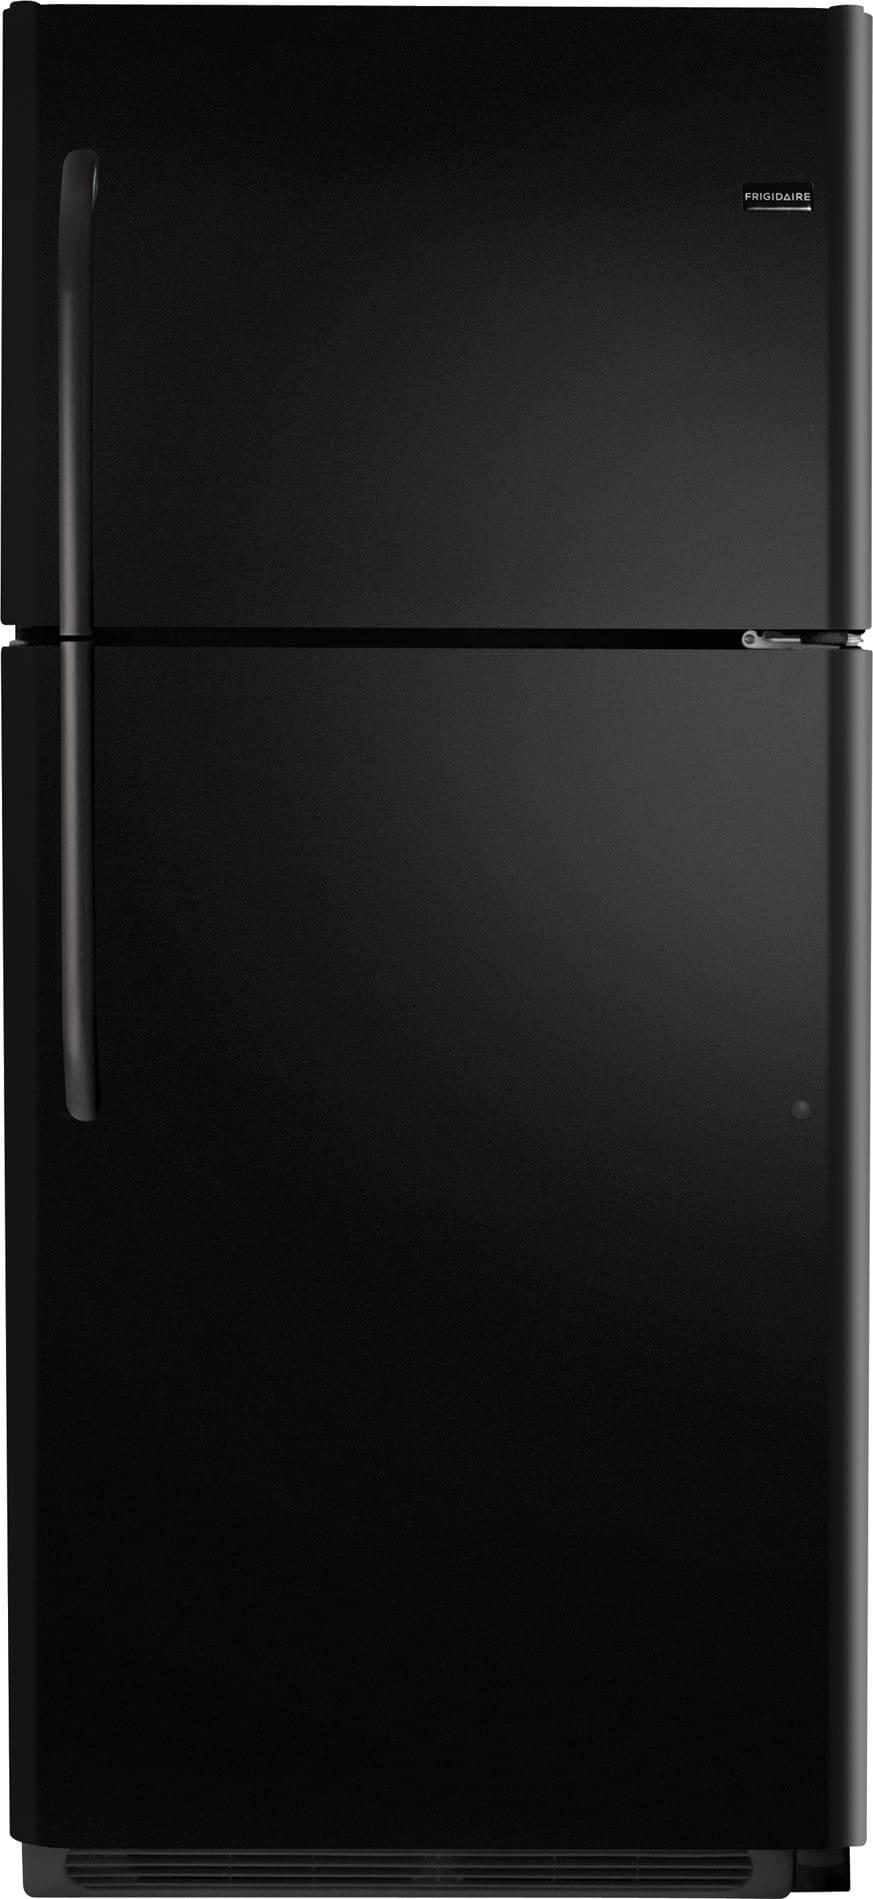 Frigidaire Fftr2131qe 30 Inch Top Freezer Refrigerator